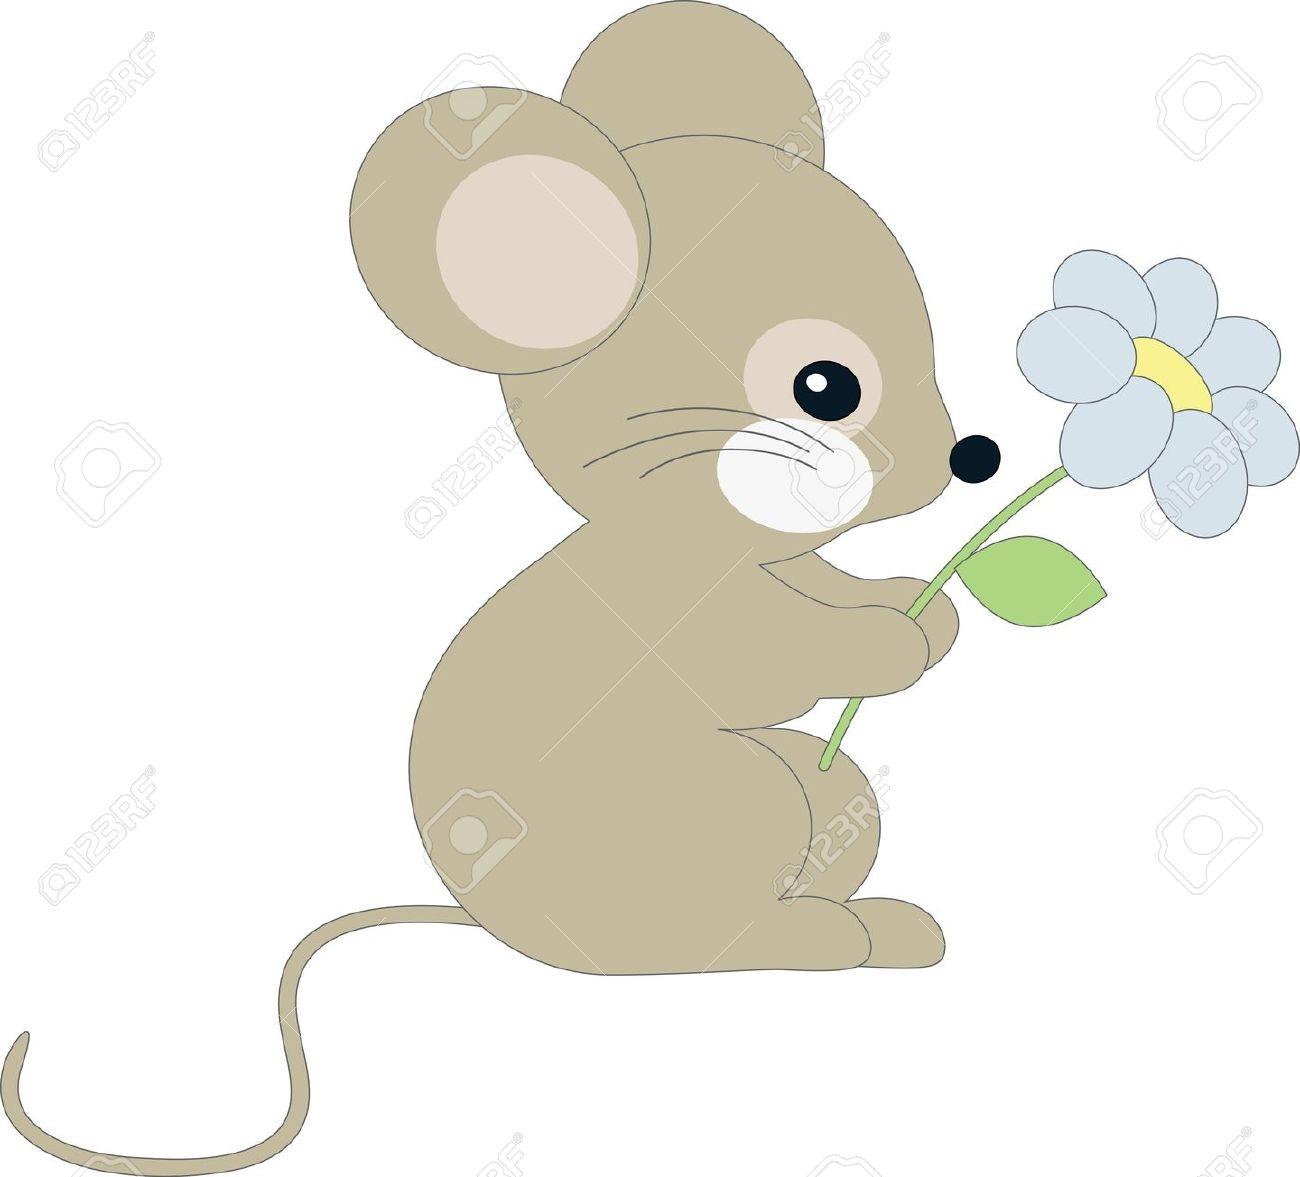 Mice clipart little mouse #9